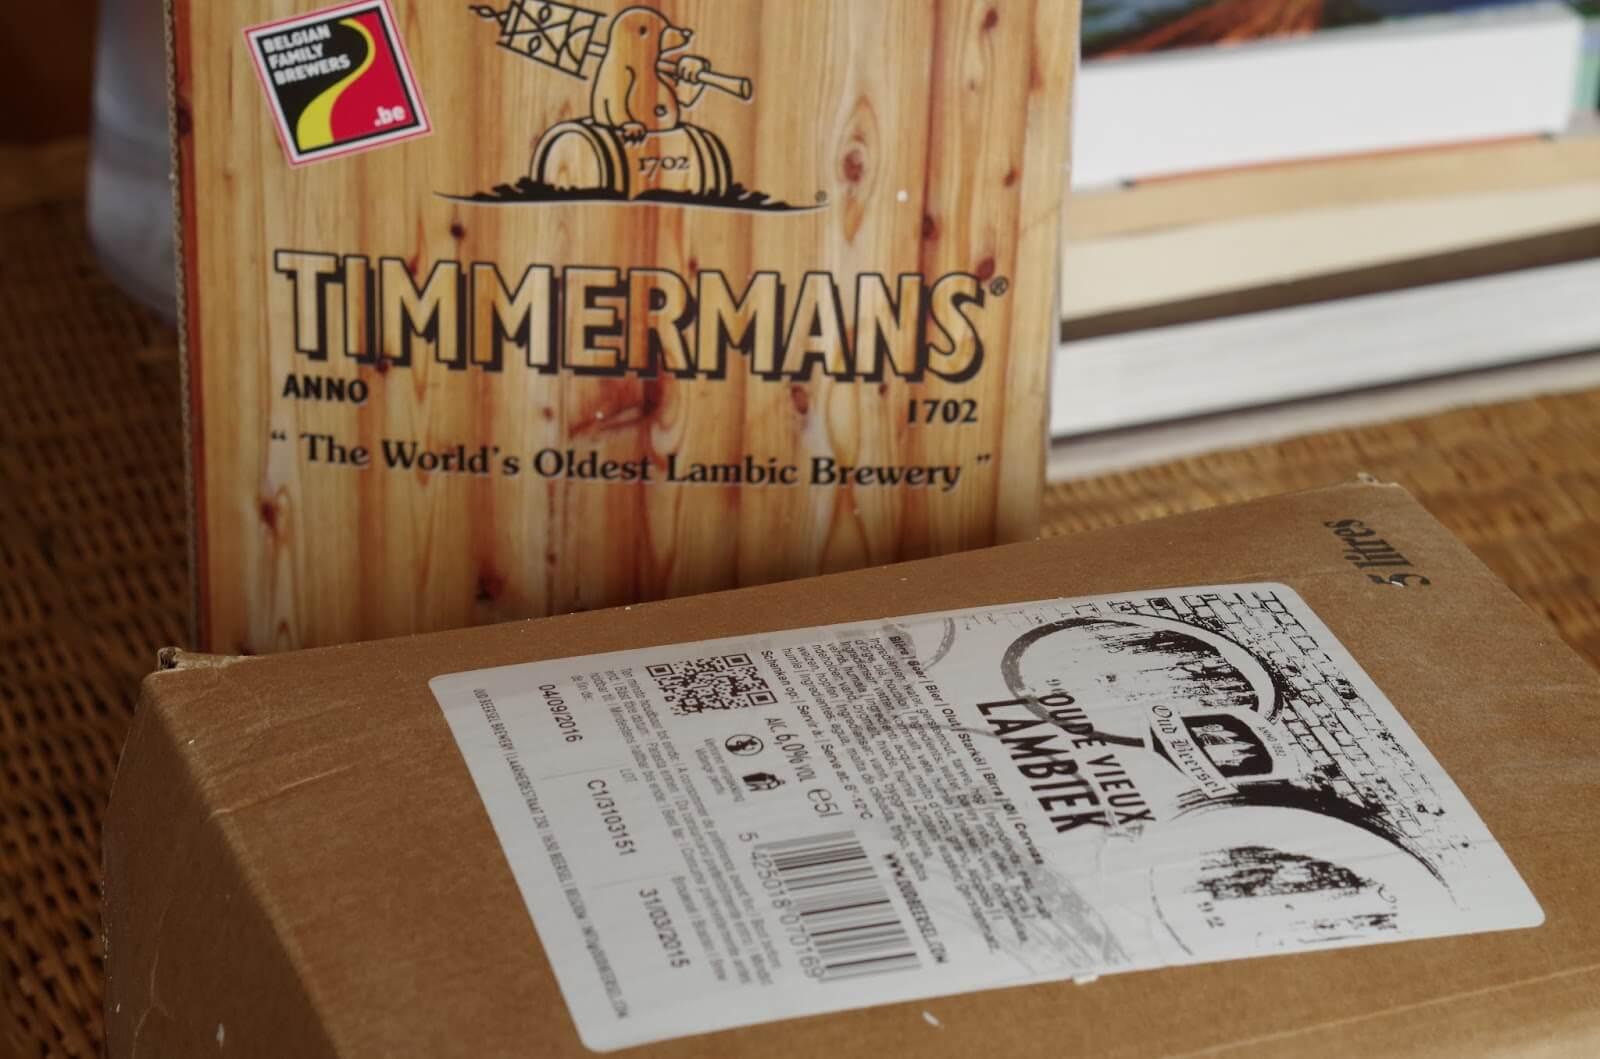 Timmermans в картонной коробке